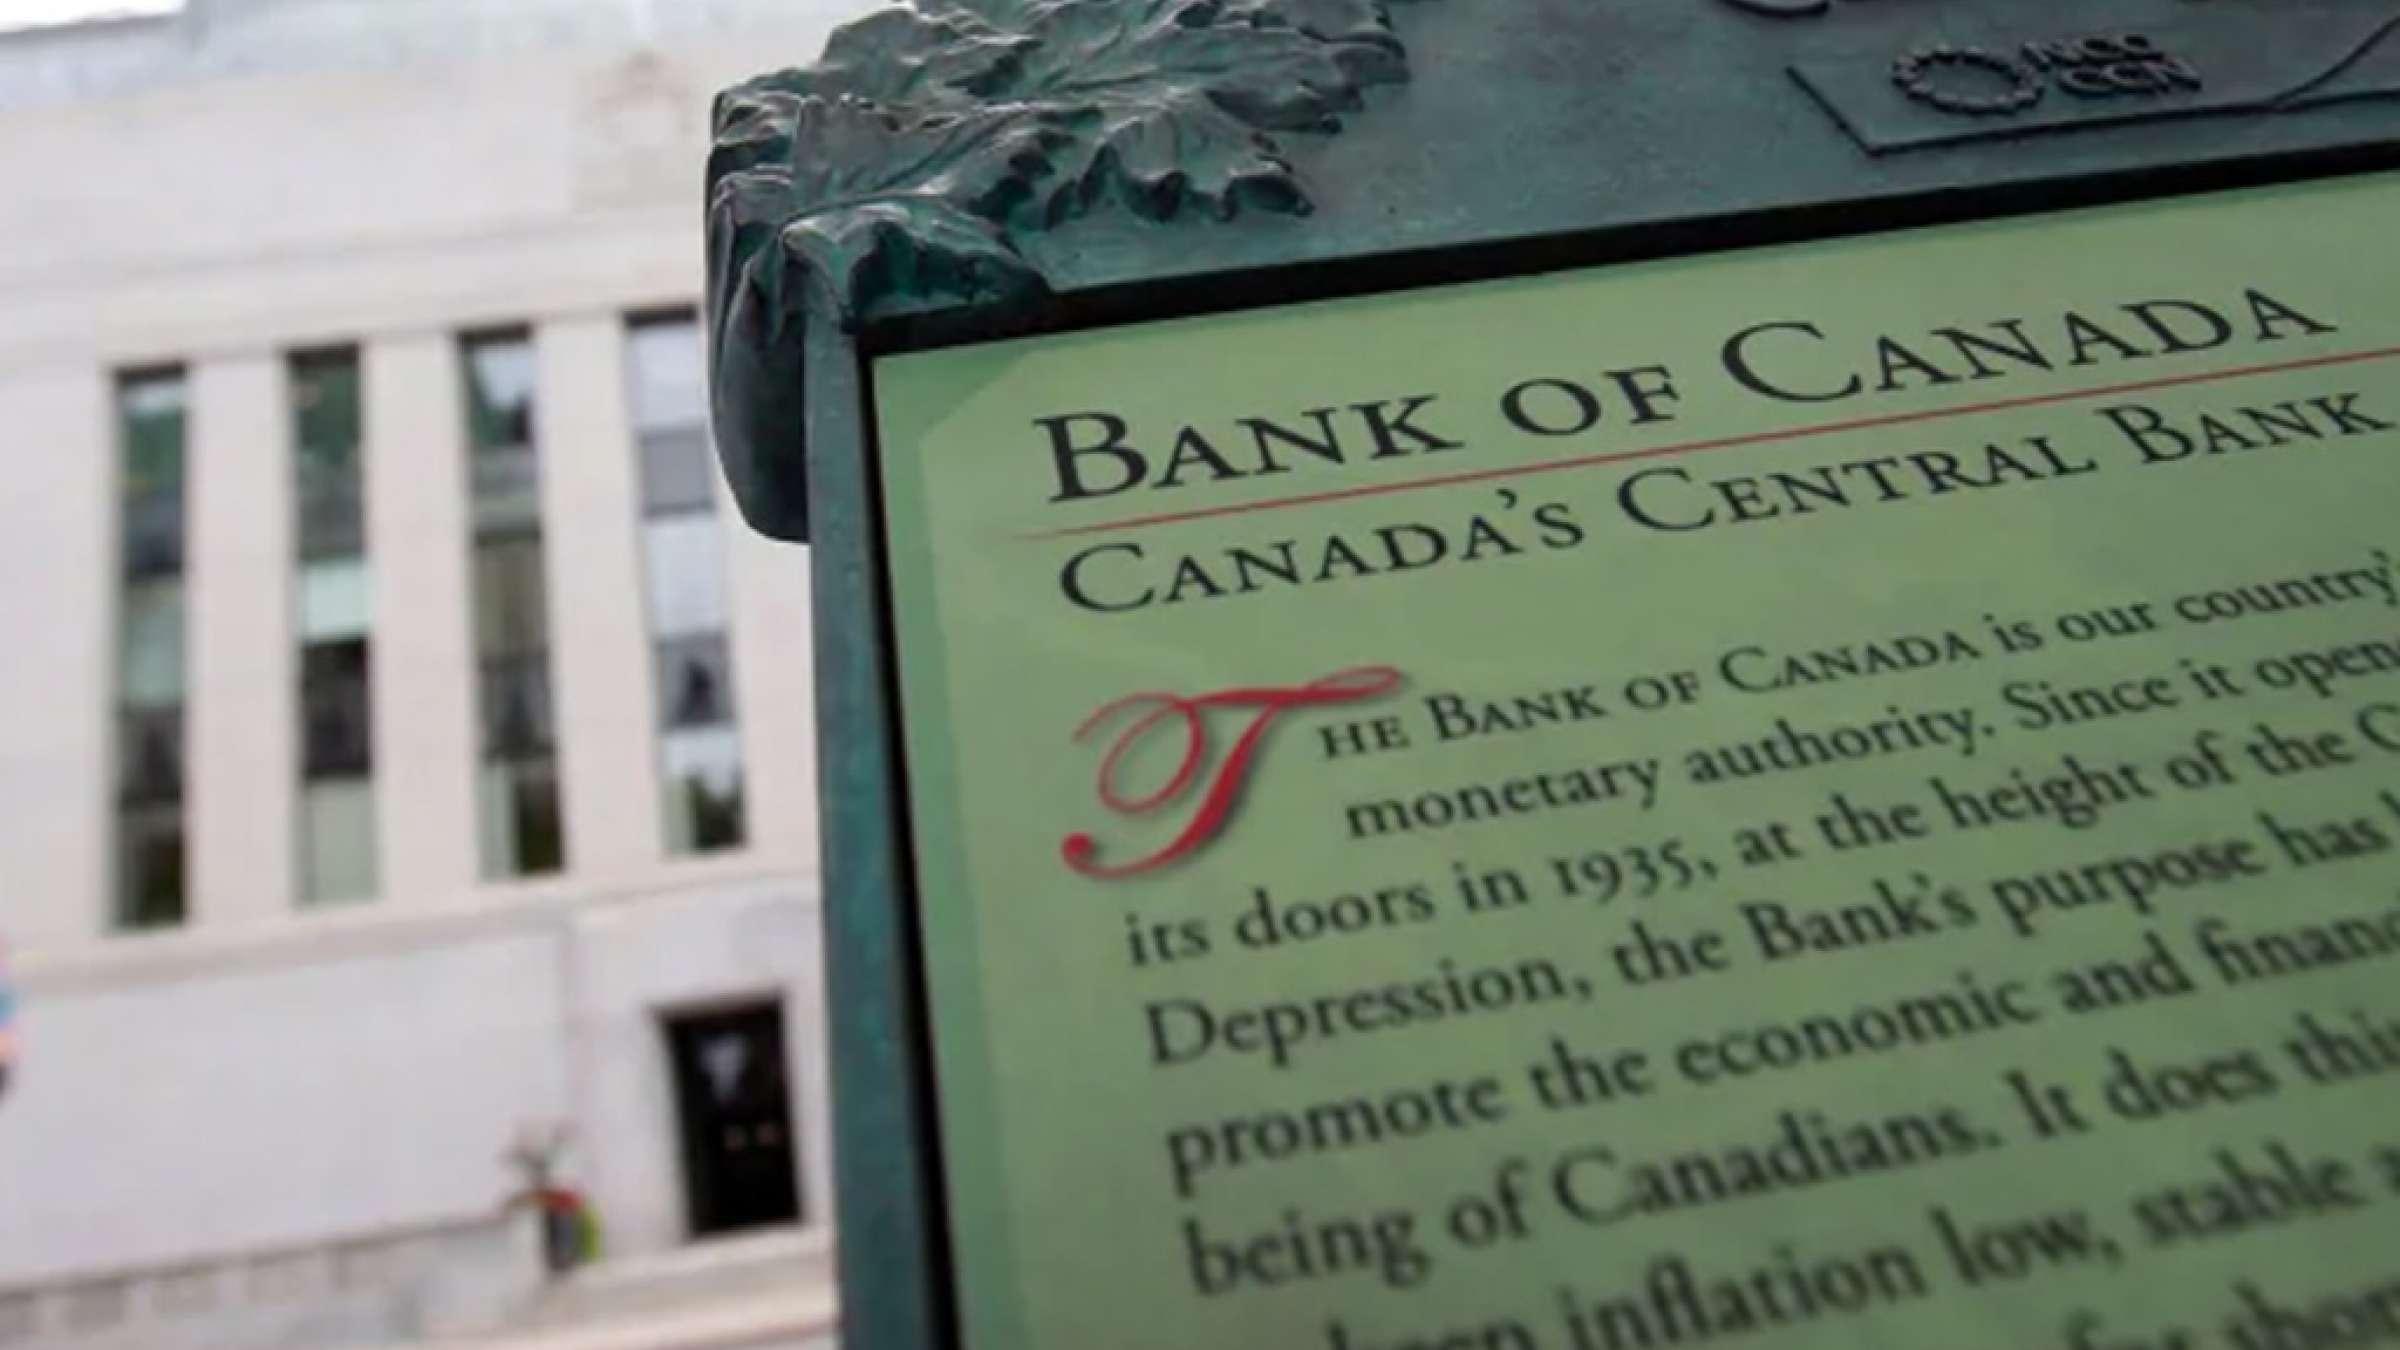 اخبار-کانادا-ثبات-نرخ-بهره-پایه-کانادا-و-اعلان-خطر-بانک-مرکزی